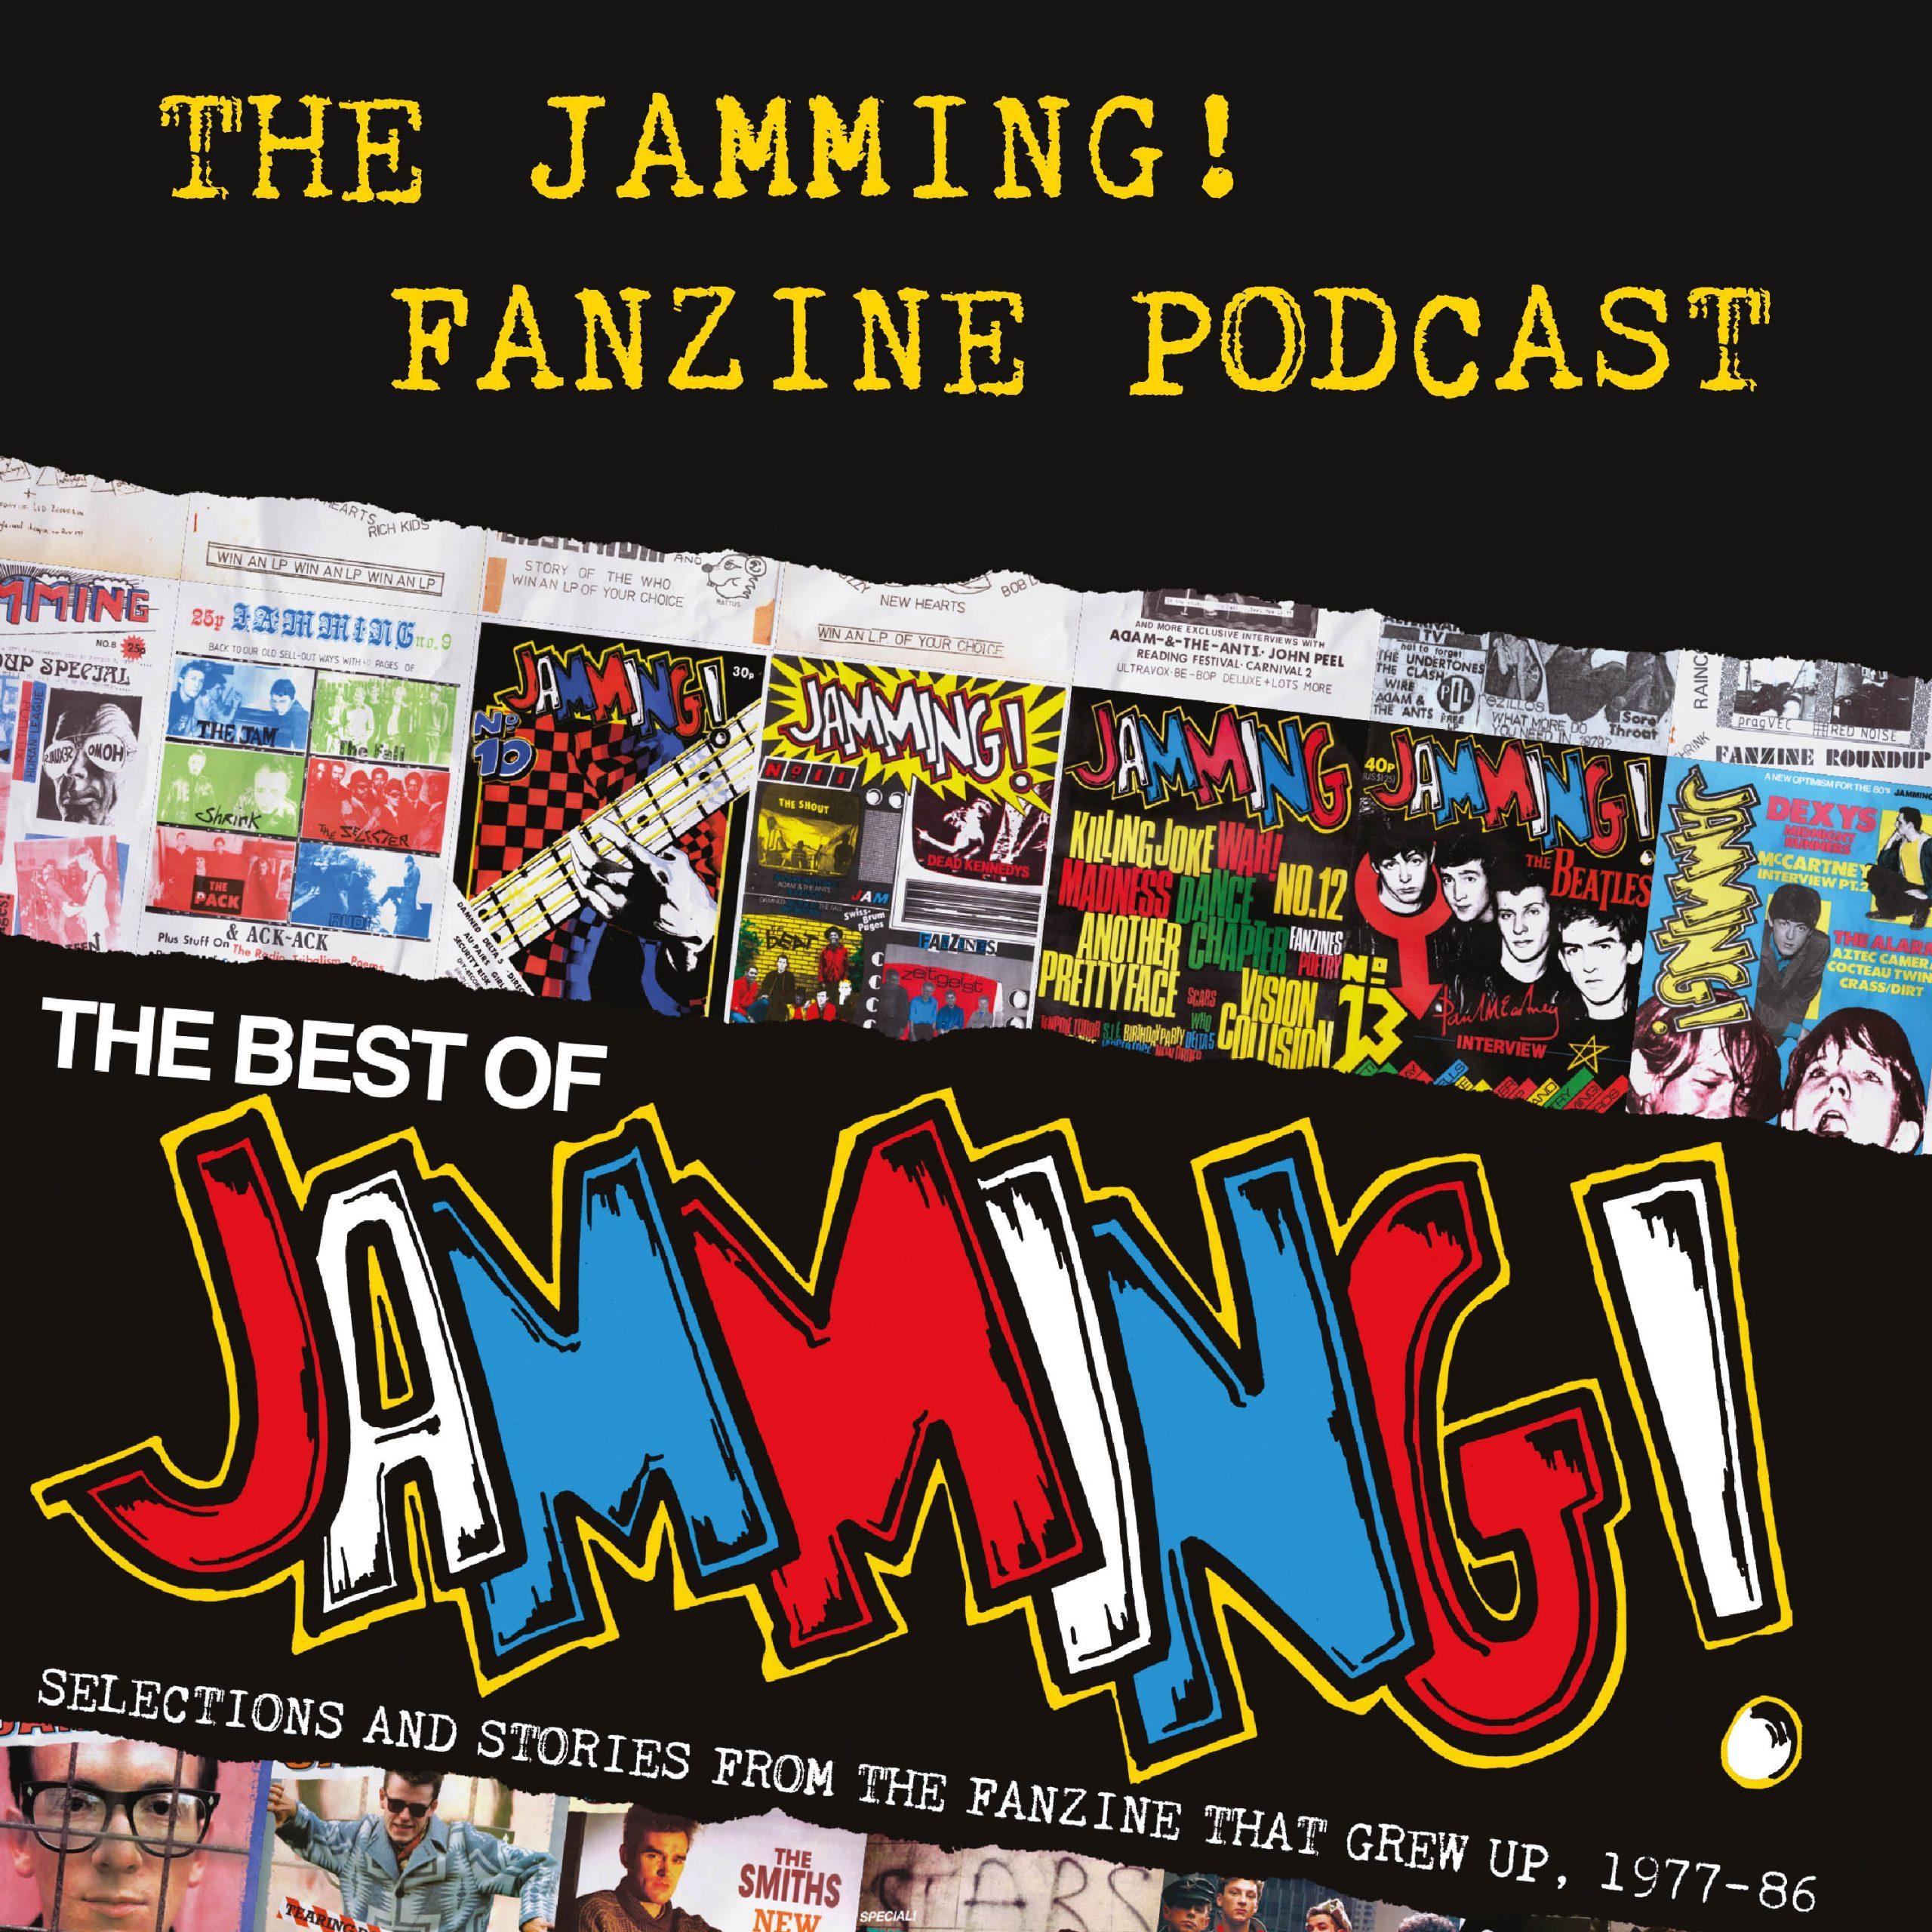 Jamming podcast cover photo v4